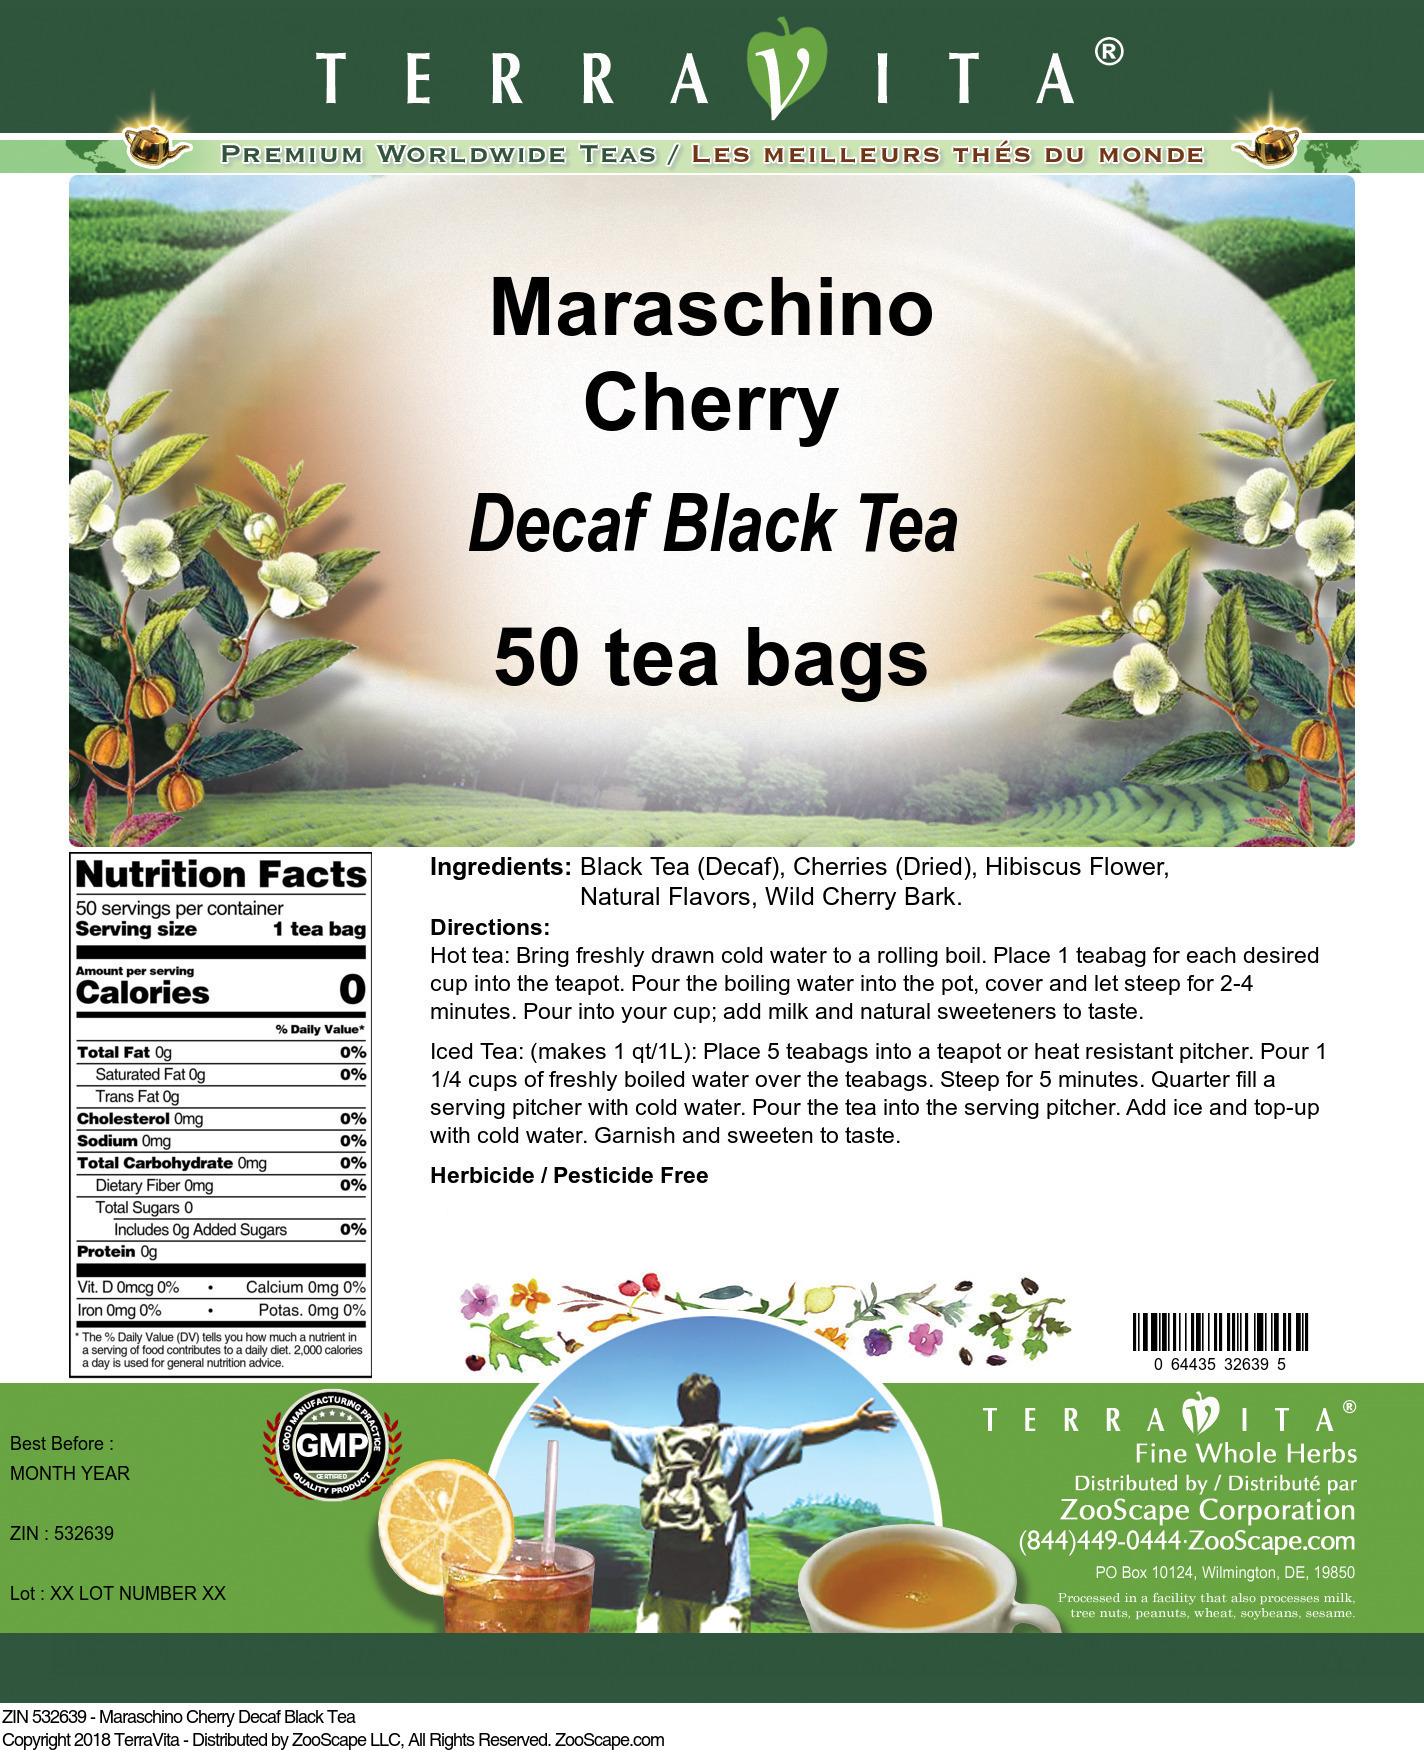 Maraschino Cherry Decaf Black Tea